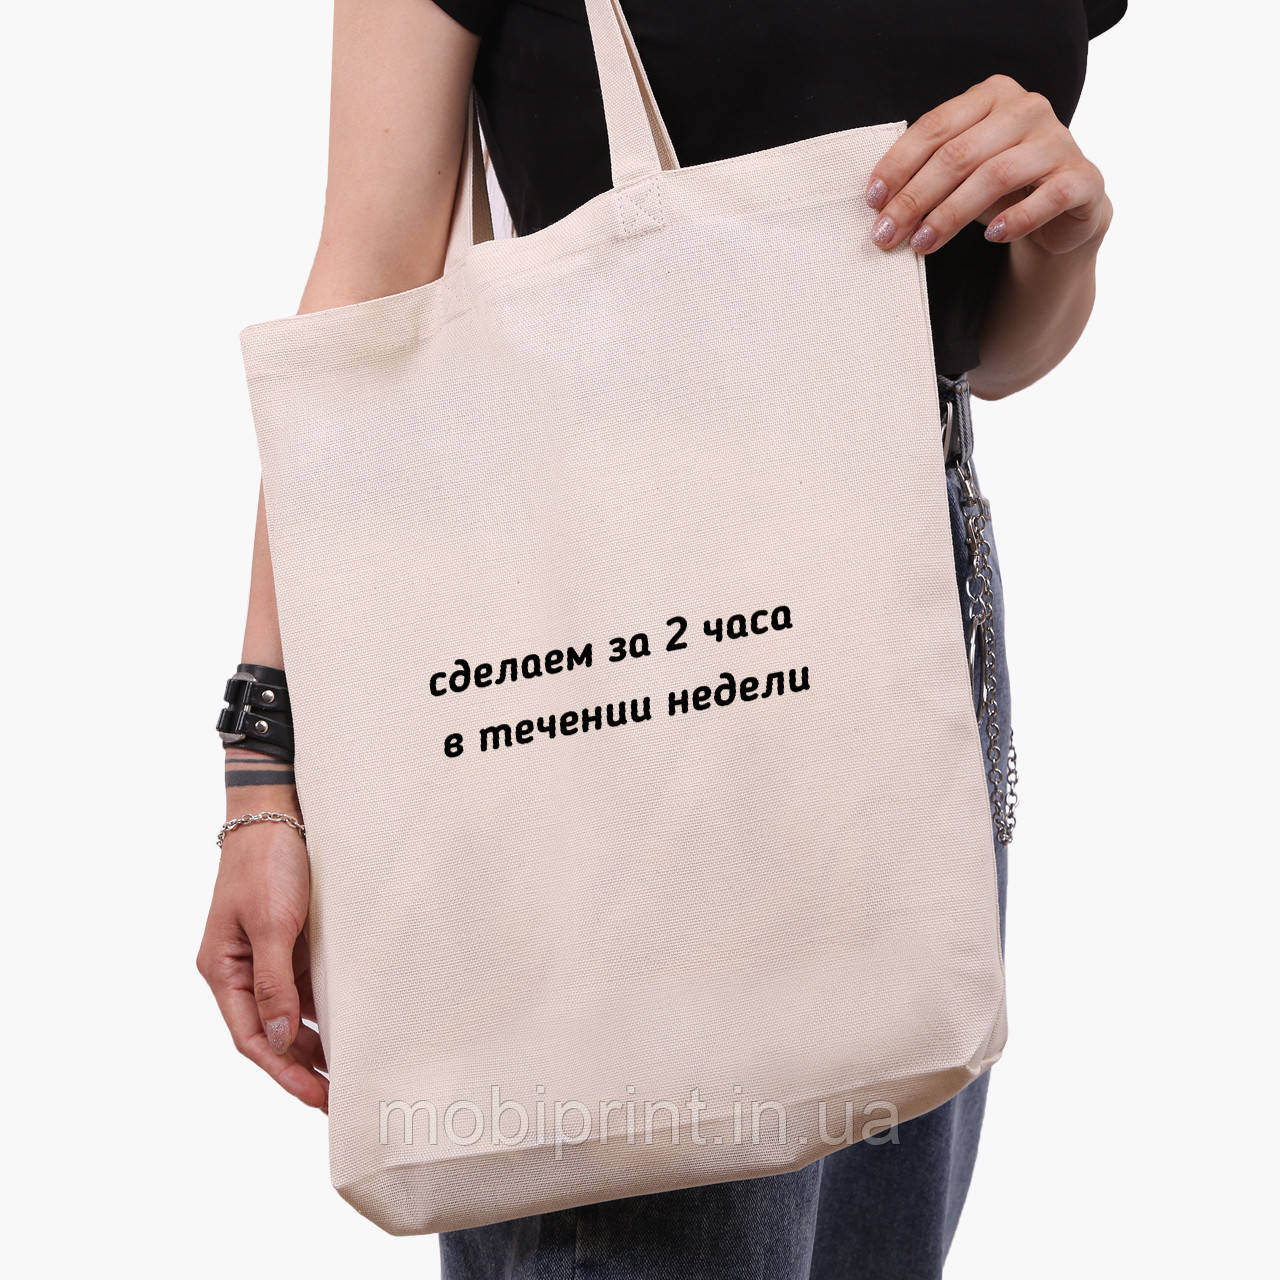 Еко-сумка з принтом (23-49) Чорний